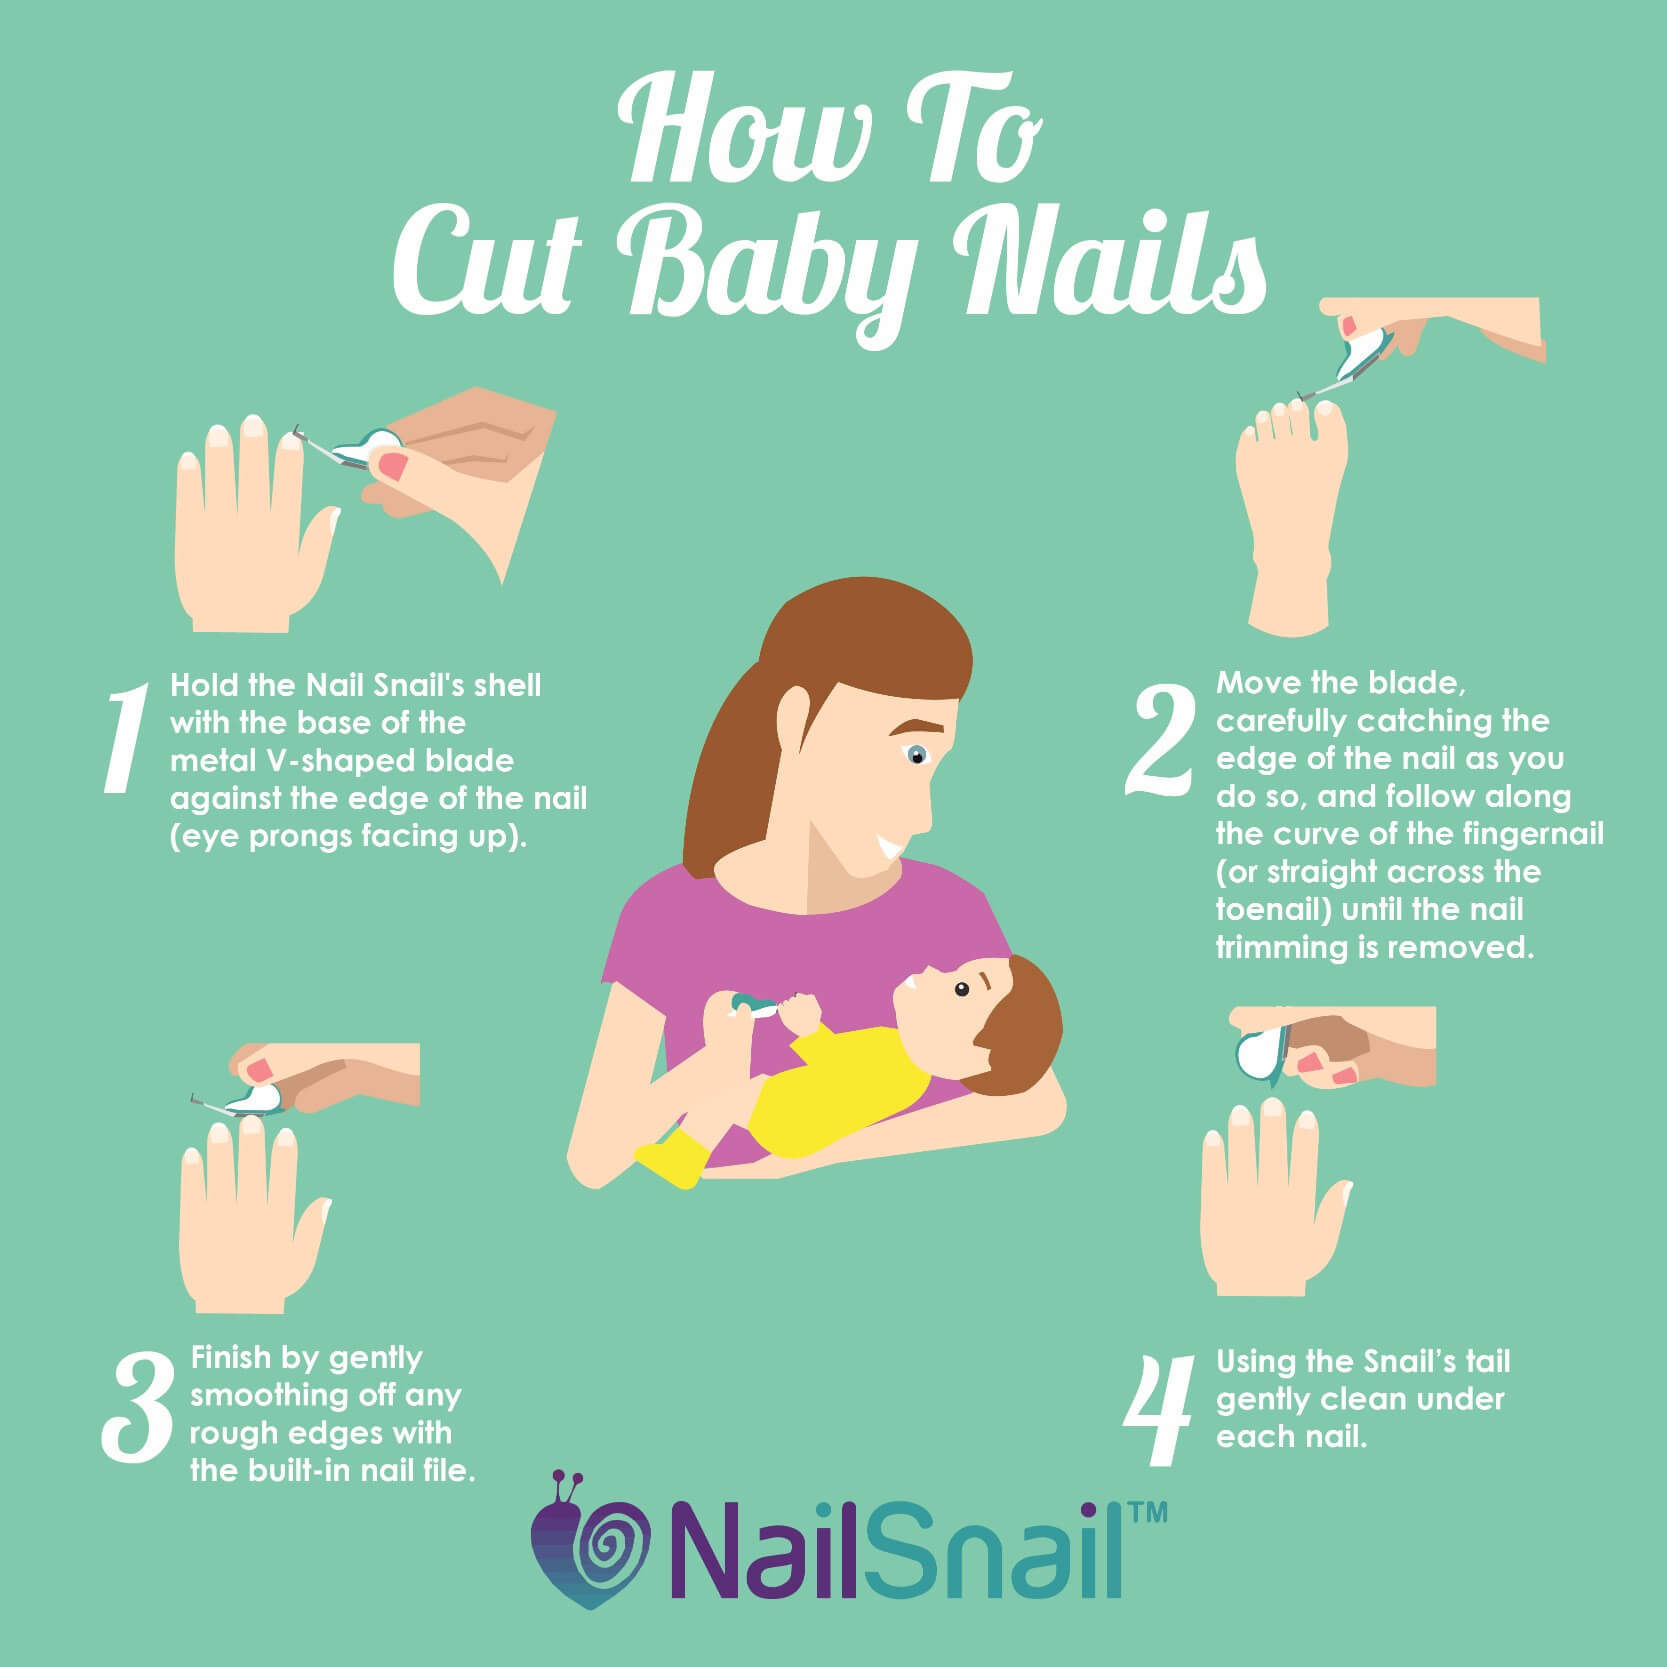 Nail Snail - How to Cut Baby Nails